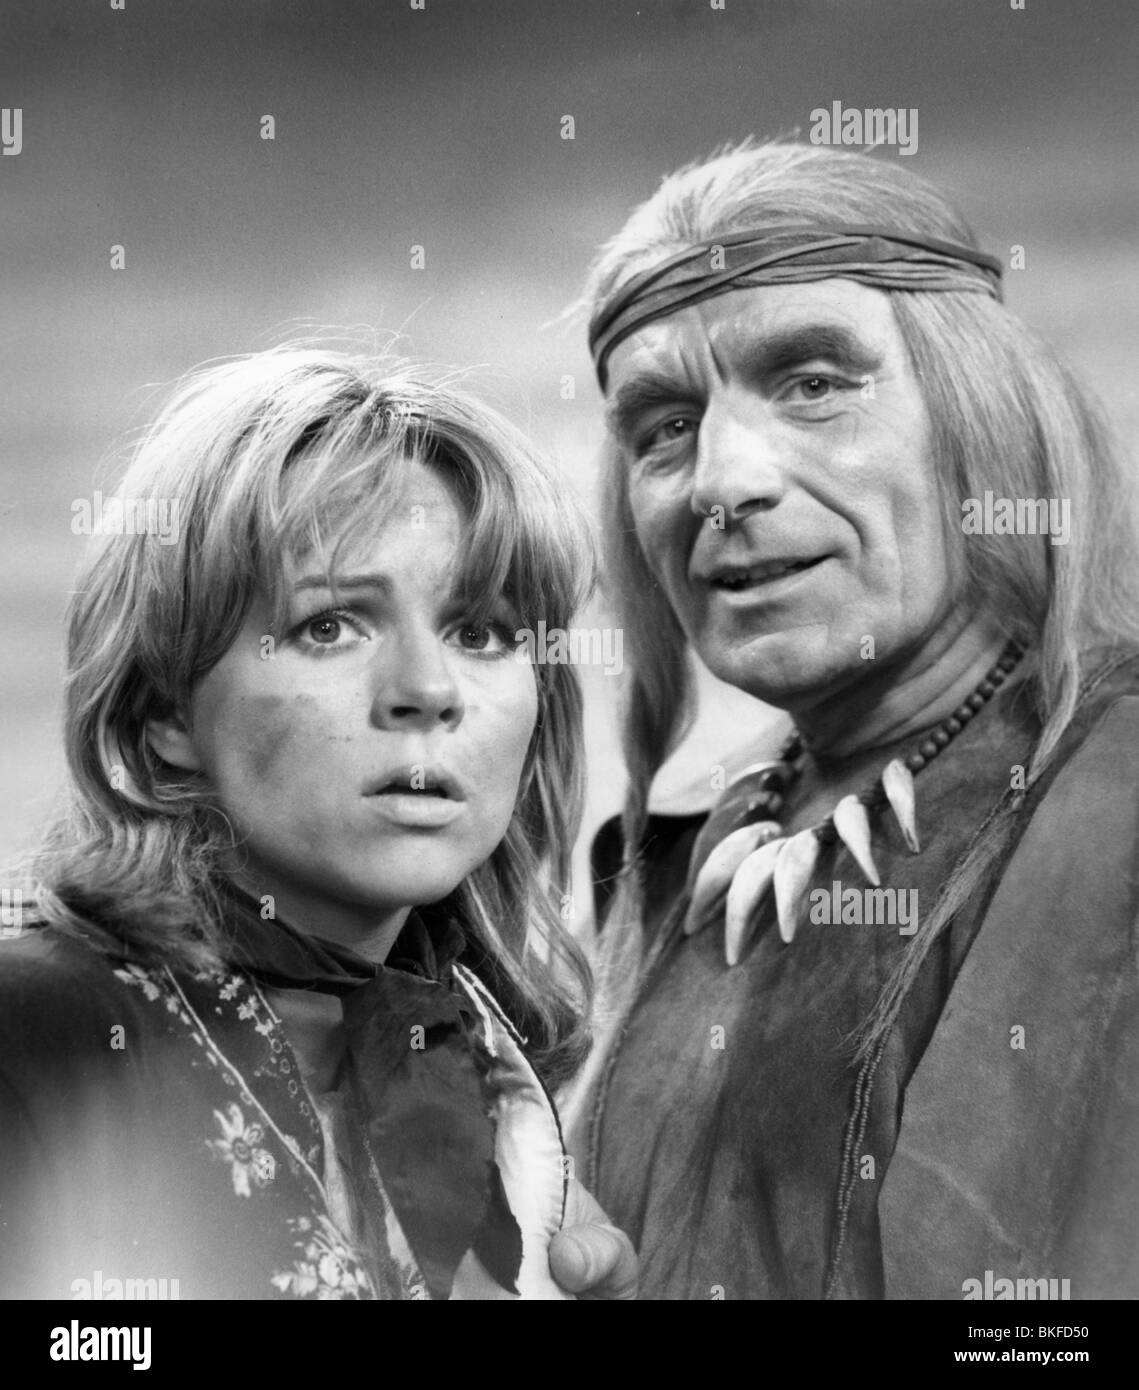 "telecast, ""Polly"", DEU 1975, director: Juergen Flimm, scene with: Cornelia Froboess, Romuald Pekny, tv, broadcast, Stock Photo"